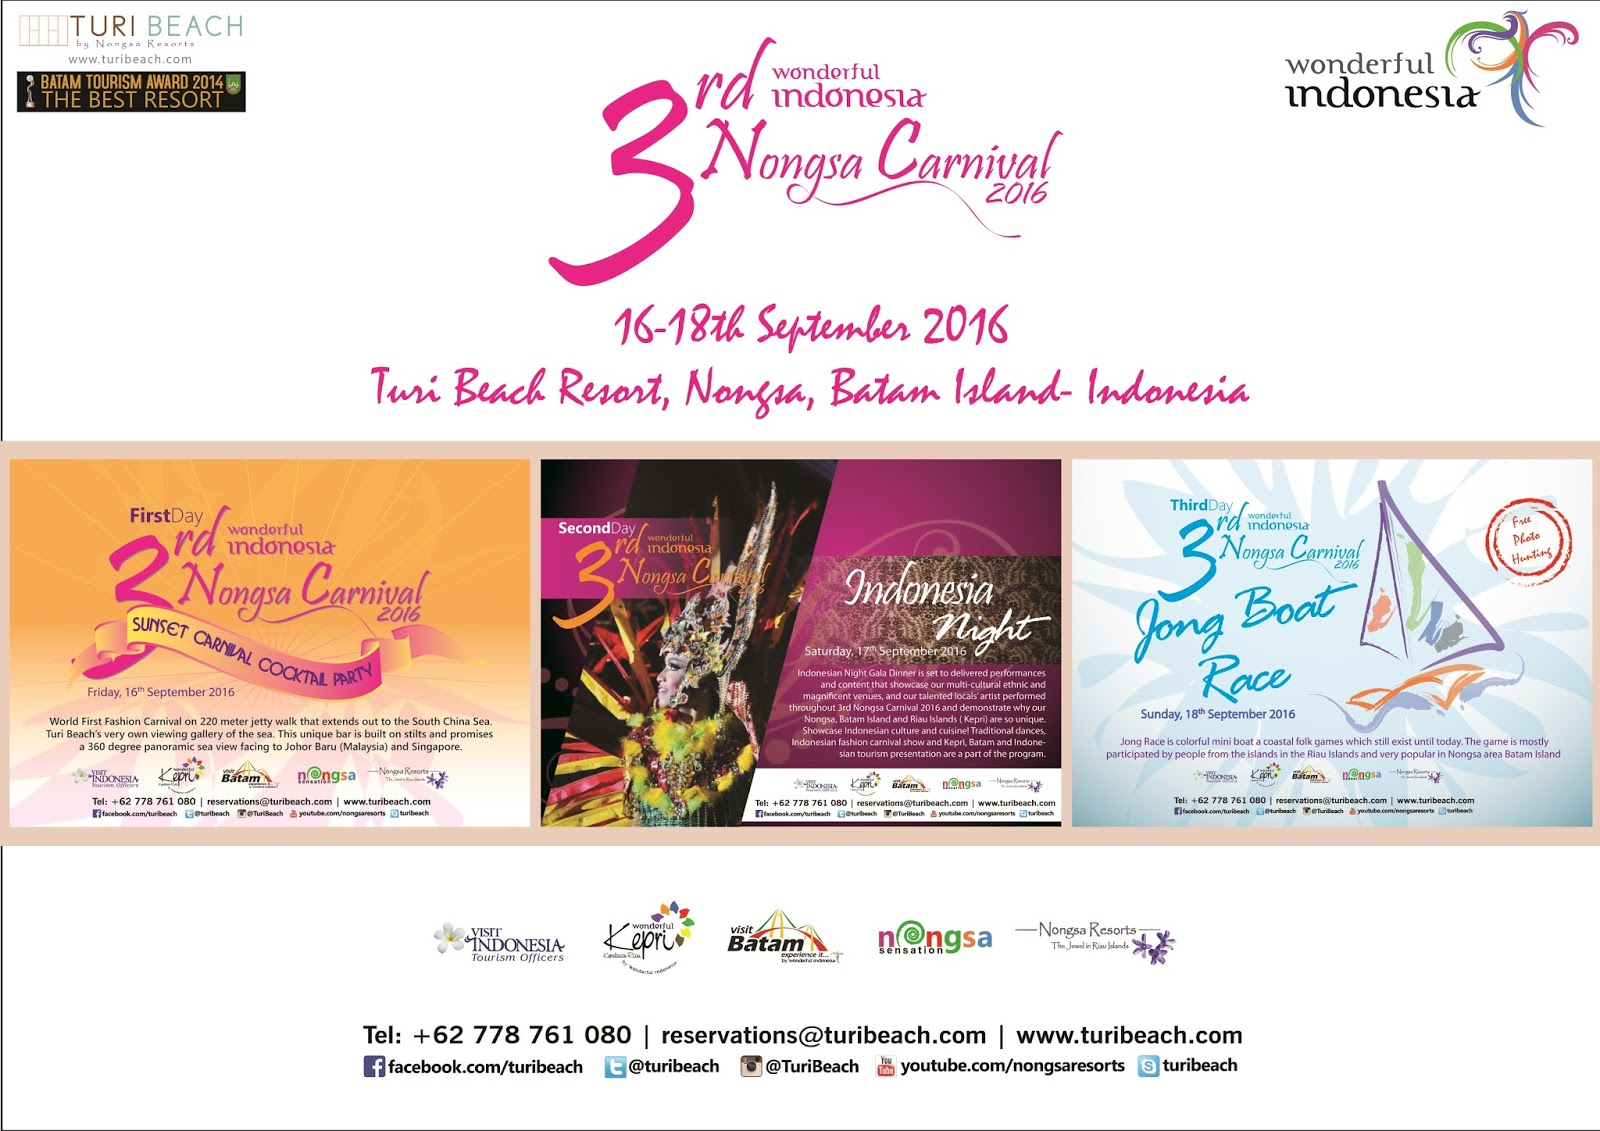 3rd Nongsa Carnival 2016 Wondefull Indonesia